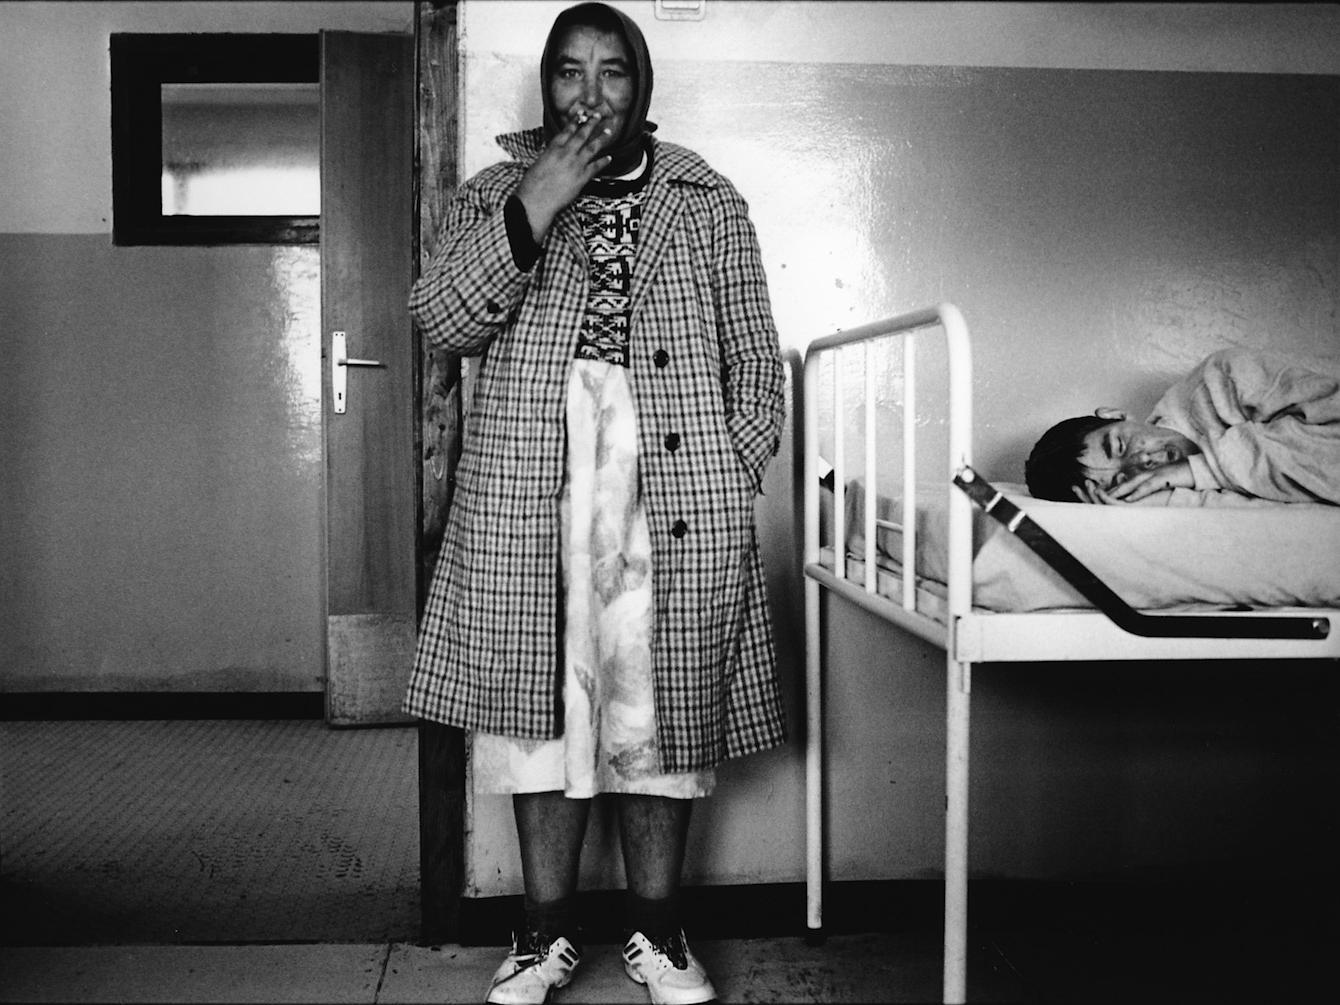 Kosovo Horror Hospital